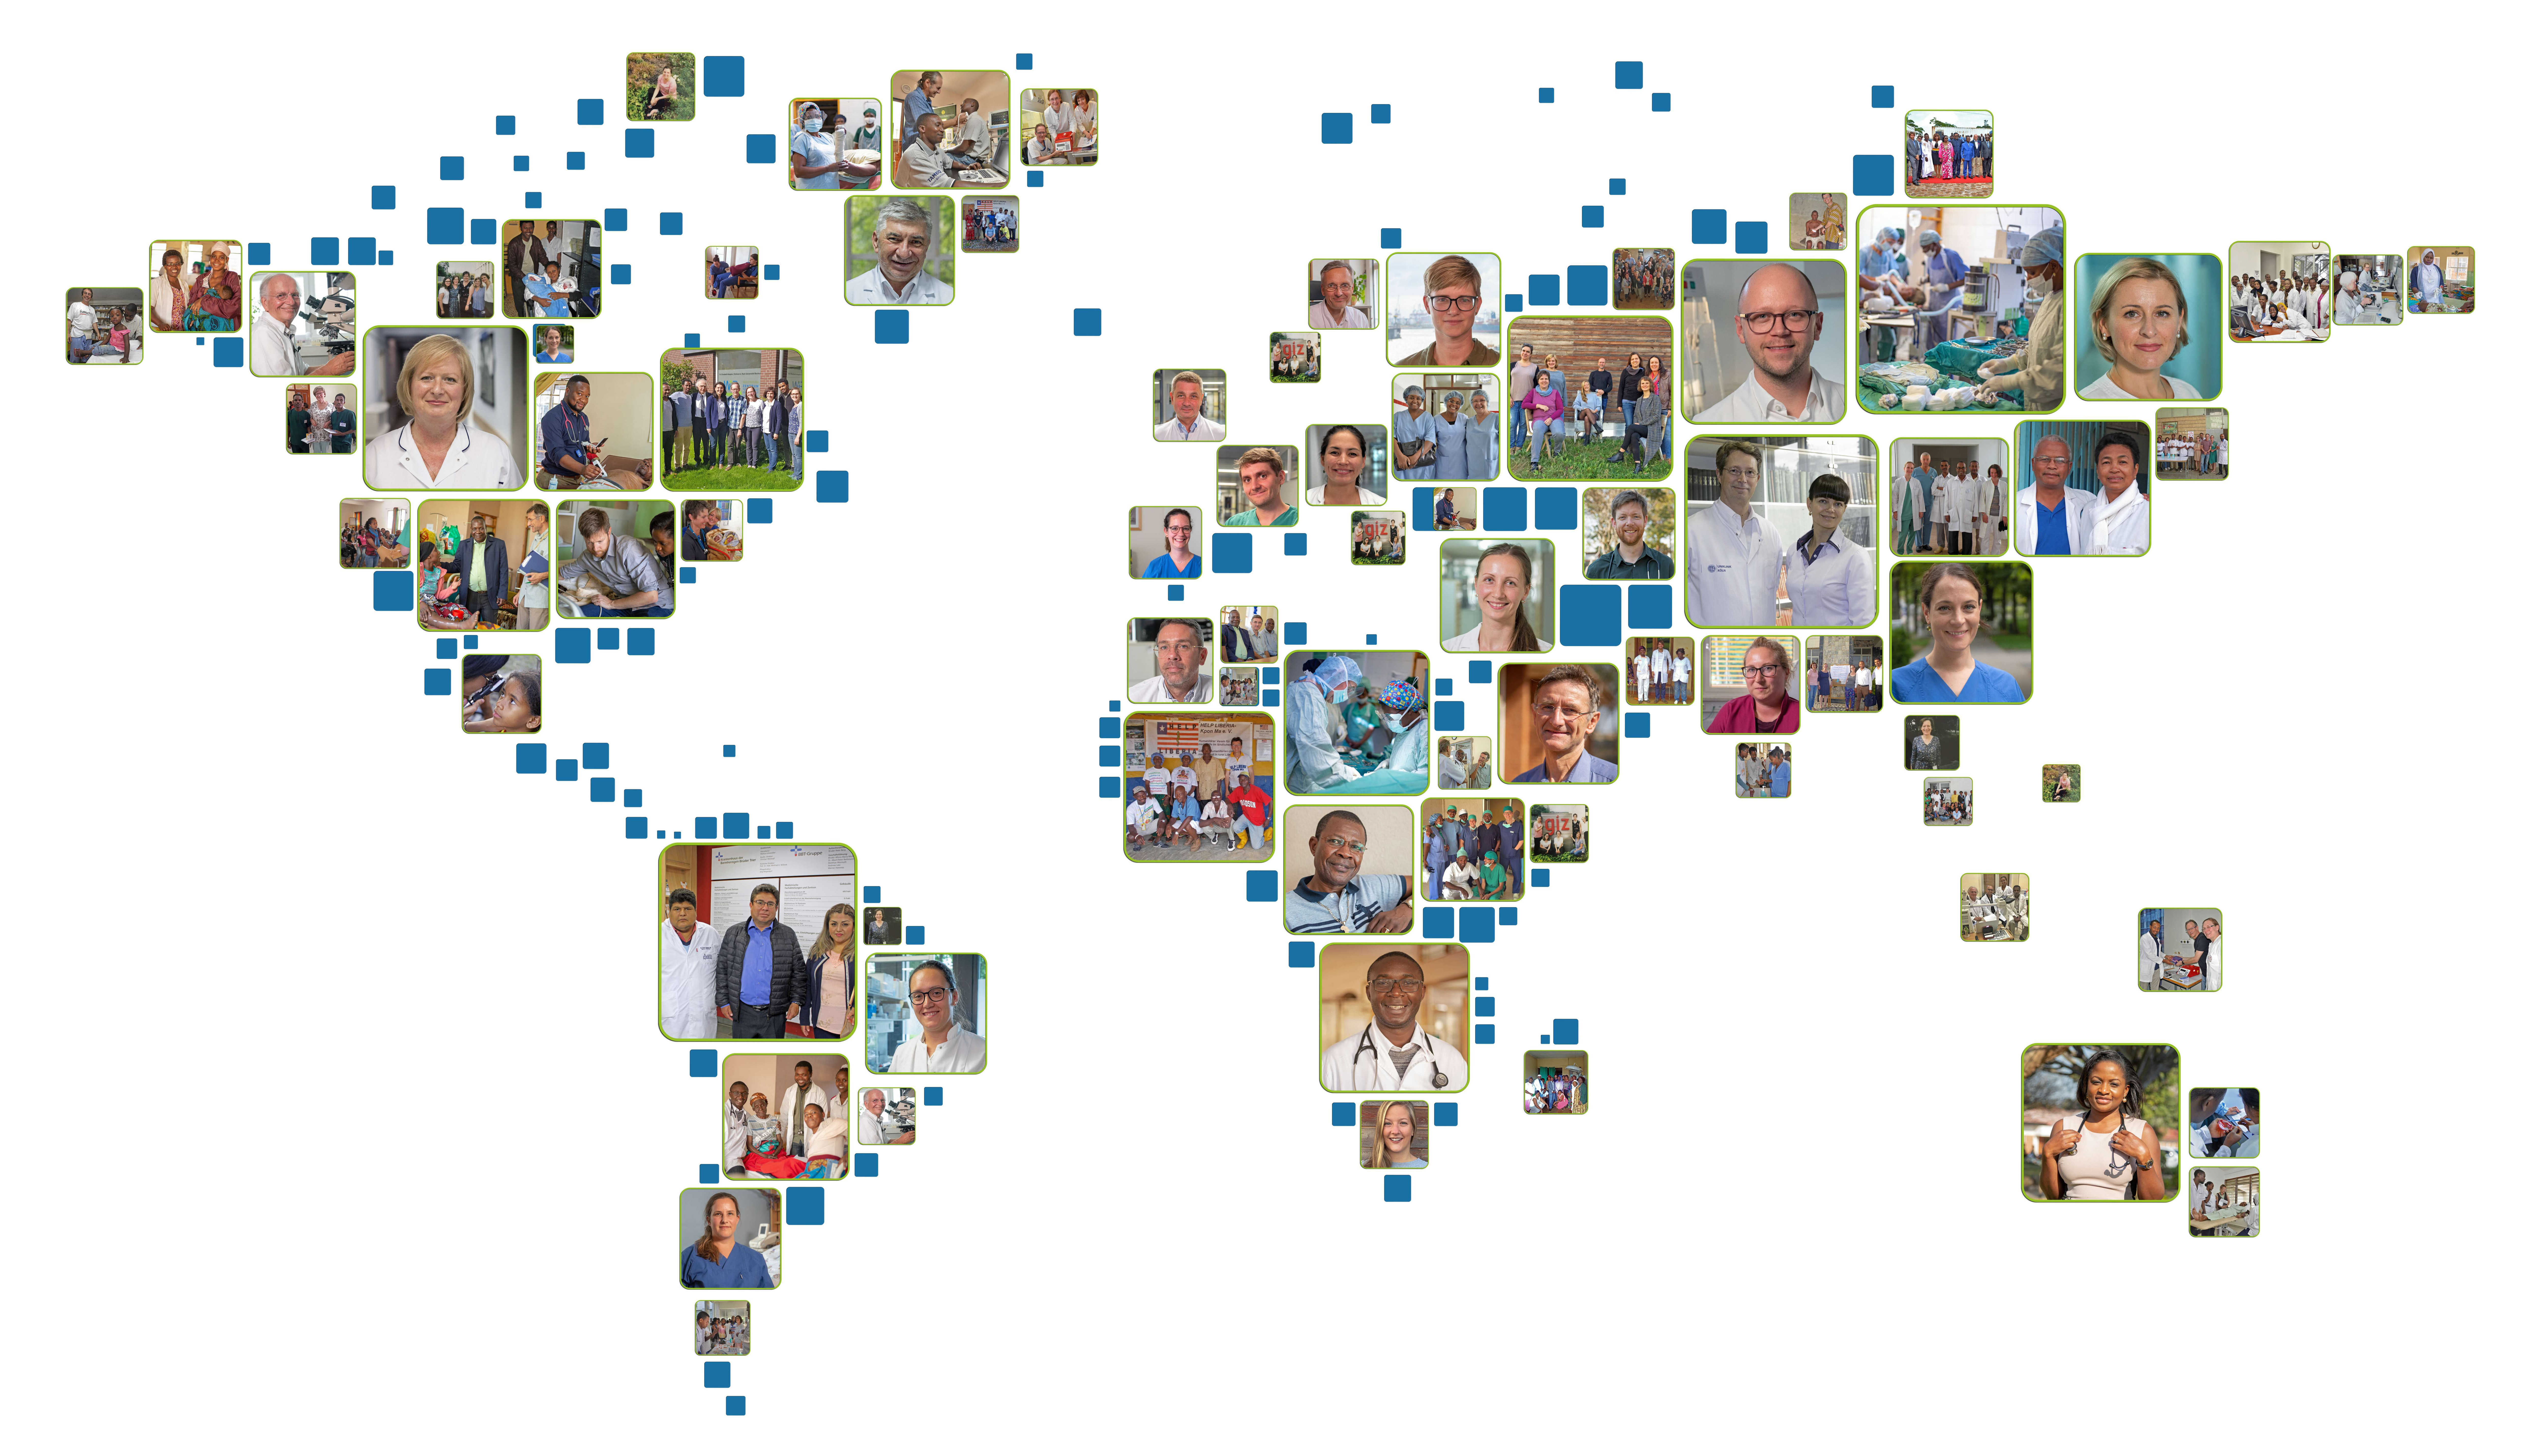 GIZ Klinikpartnerschaften Screen Weltkarte 12400x7100